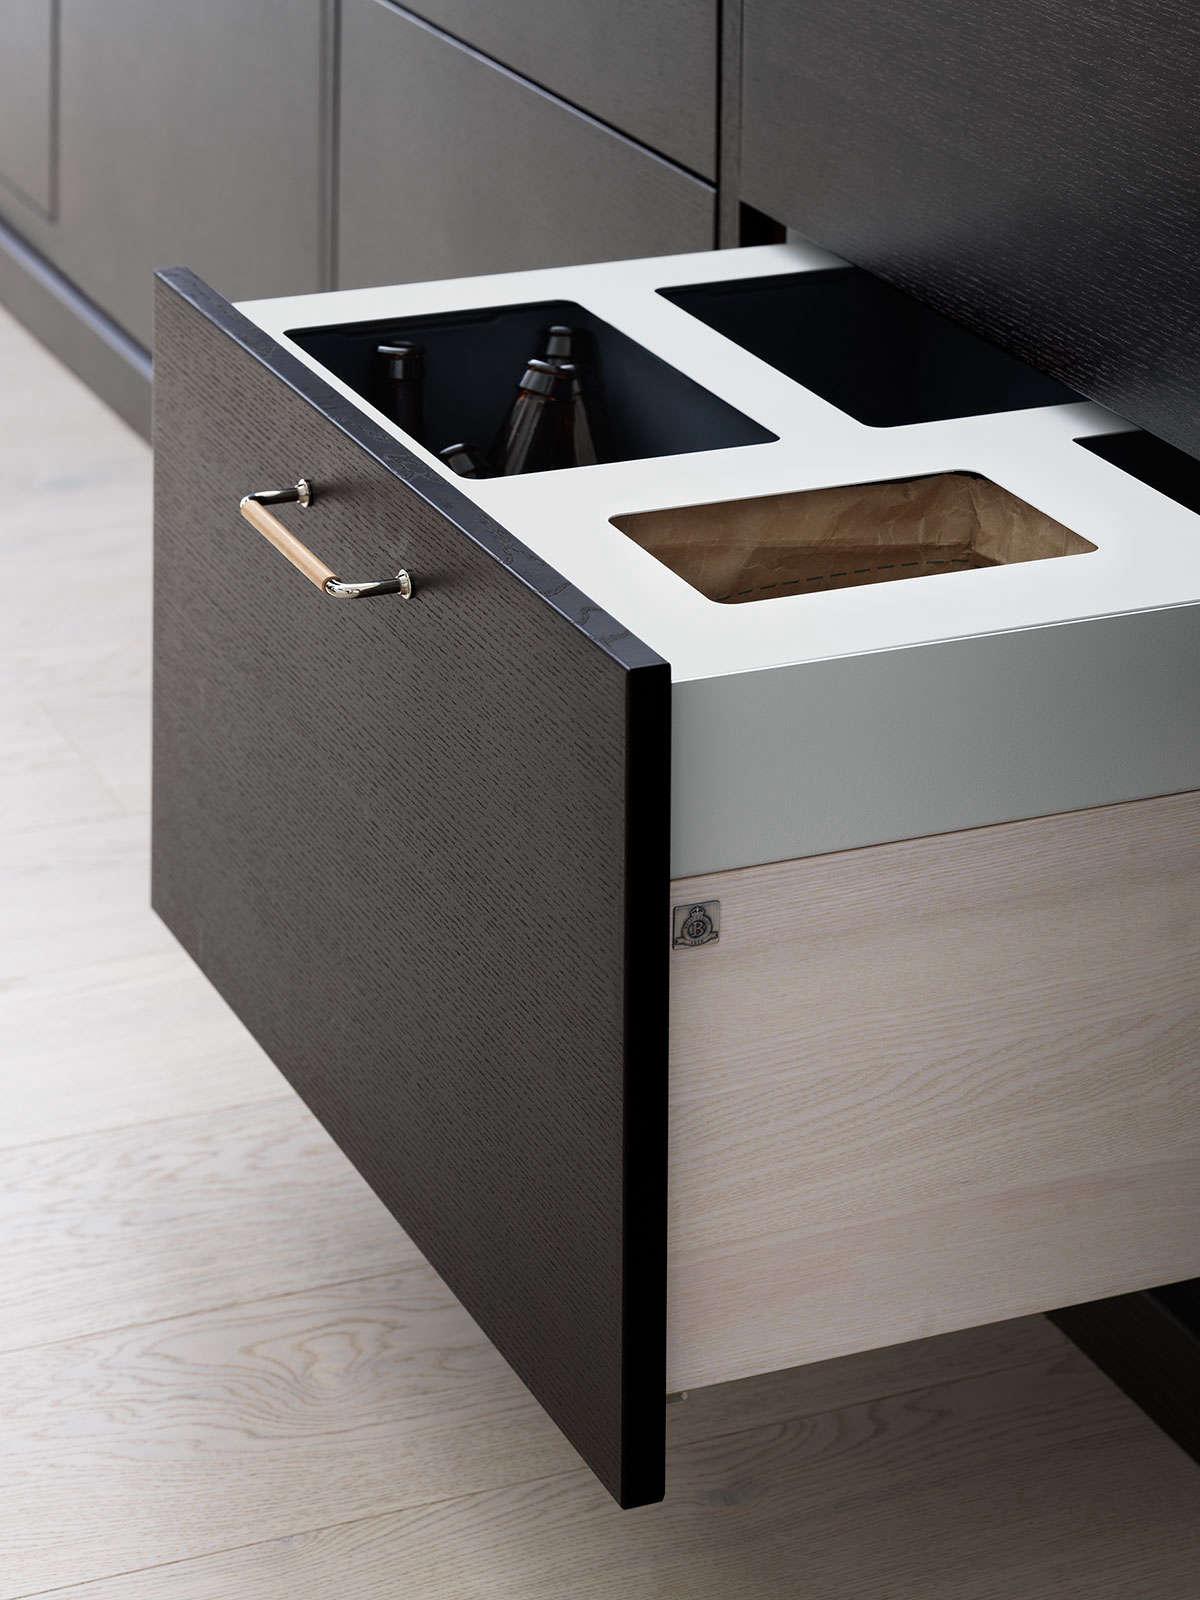 bistro kitchen in ash brown by ballingslov of sweden remodelista 6 15